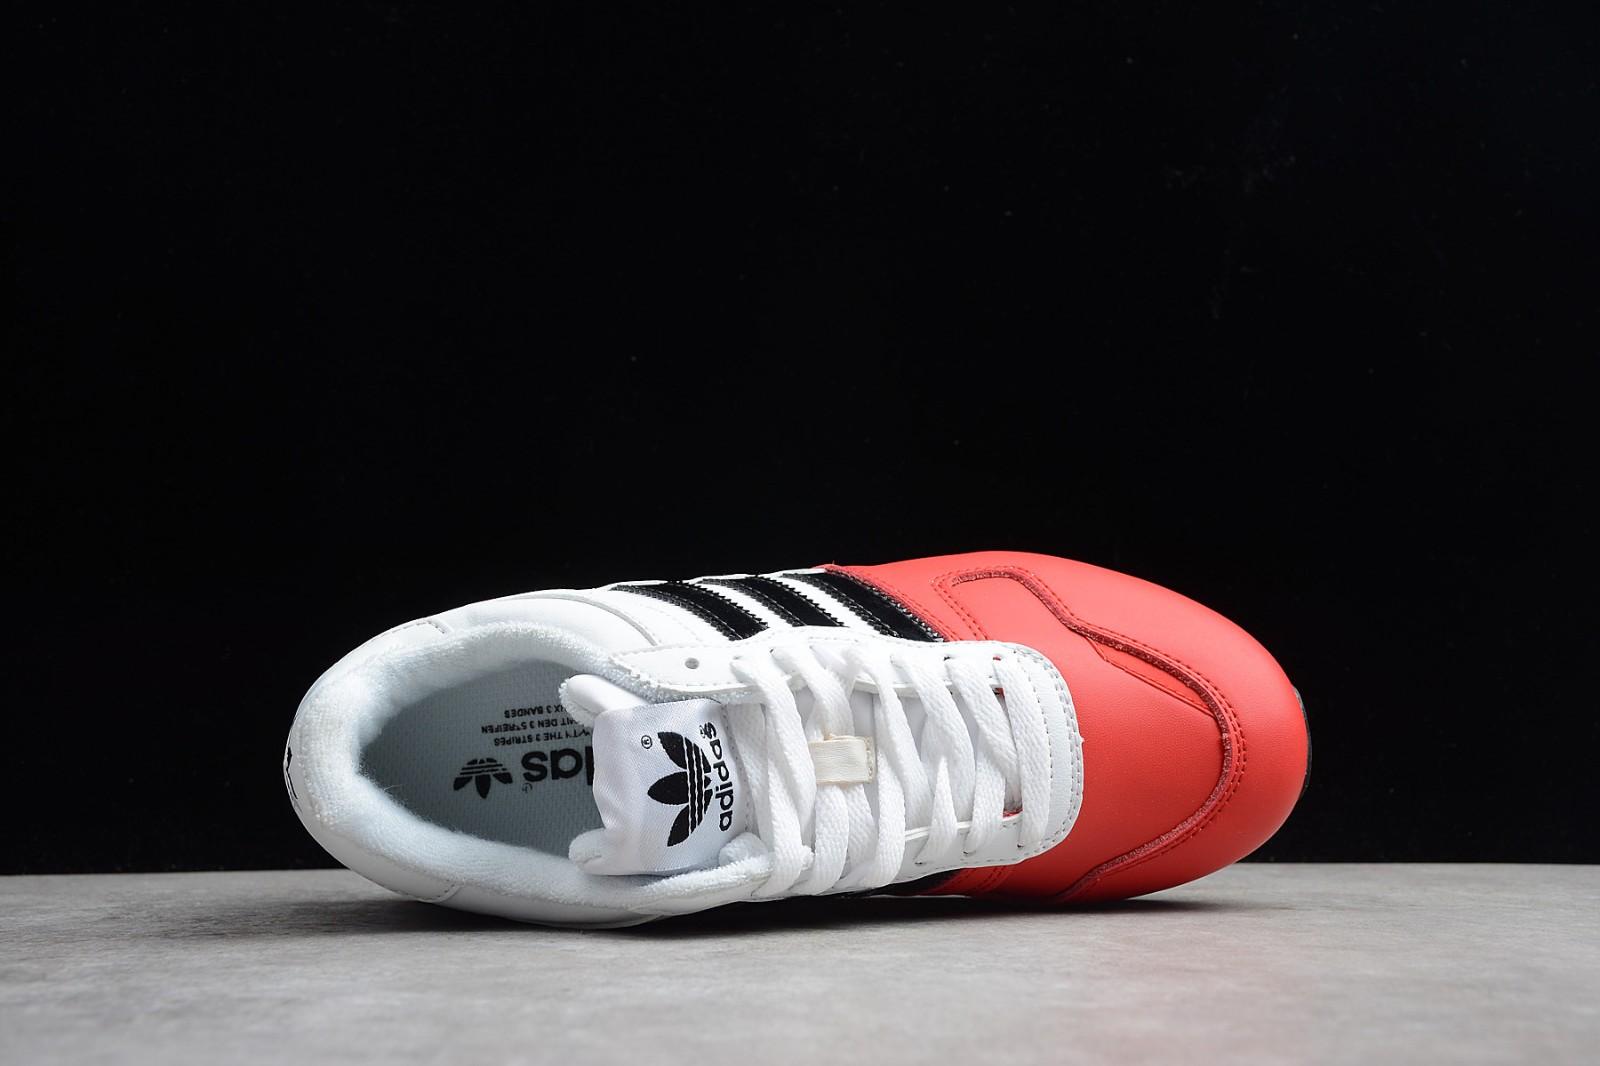 competitive price c482d 0ee06 Adidas Originals ZX 700 White Red Black AQ5316